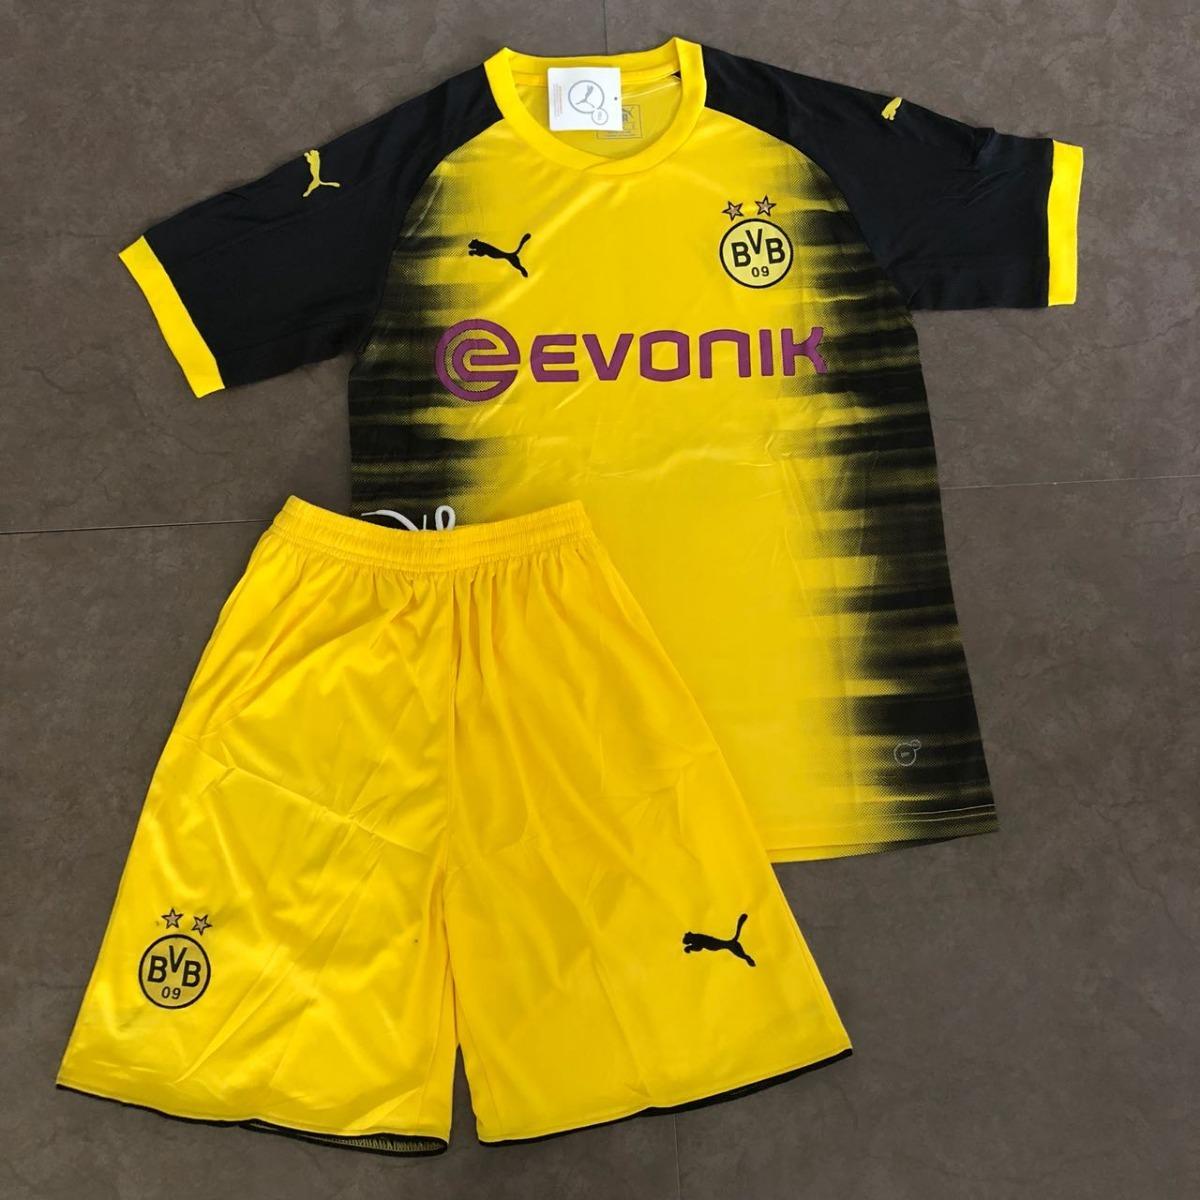 uniforme borussia dortmund infantil 2017 2018 amarelo preto. Carregando  zoom. d7885eebc0ca2